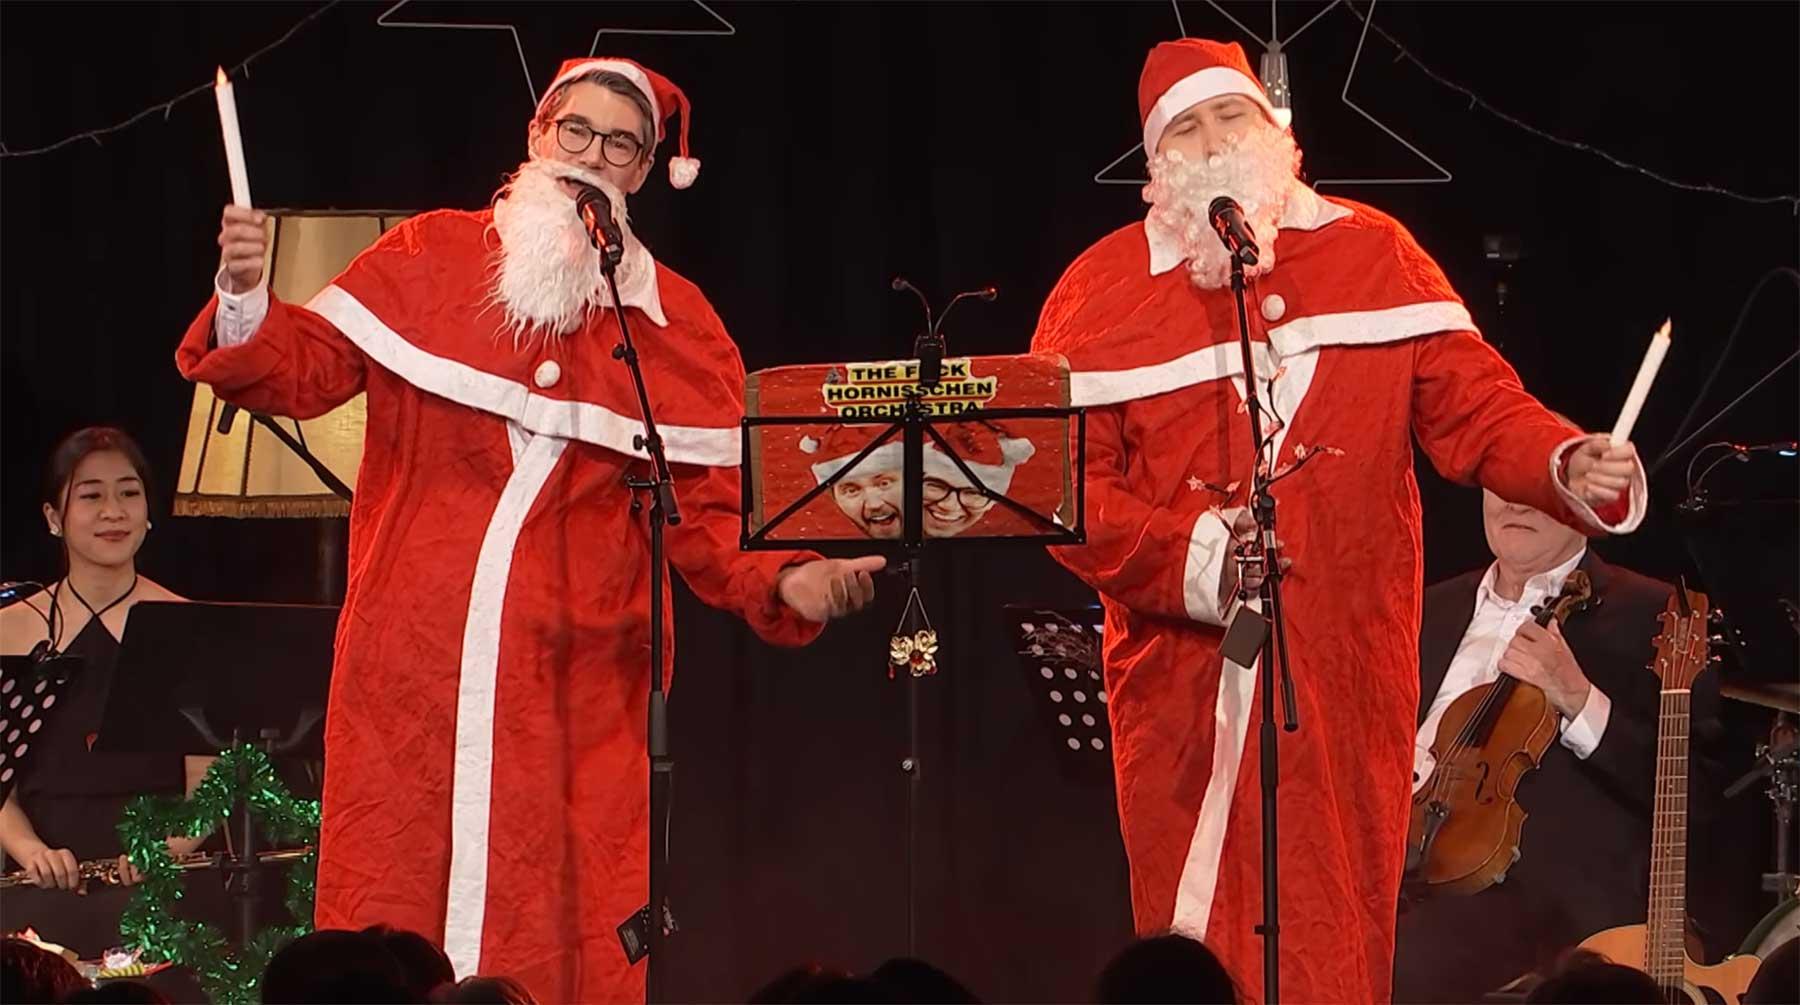 The Fuck Hornisschen Orchestra: Weihnachtsschmonzette 2018